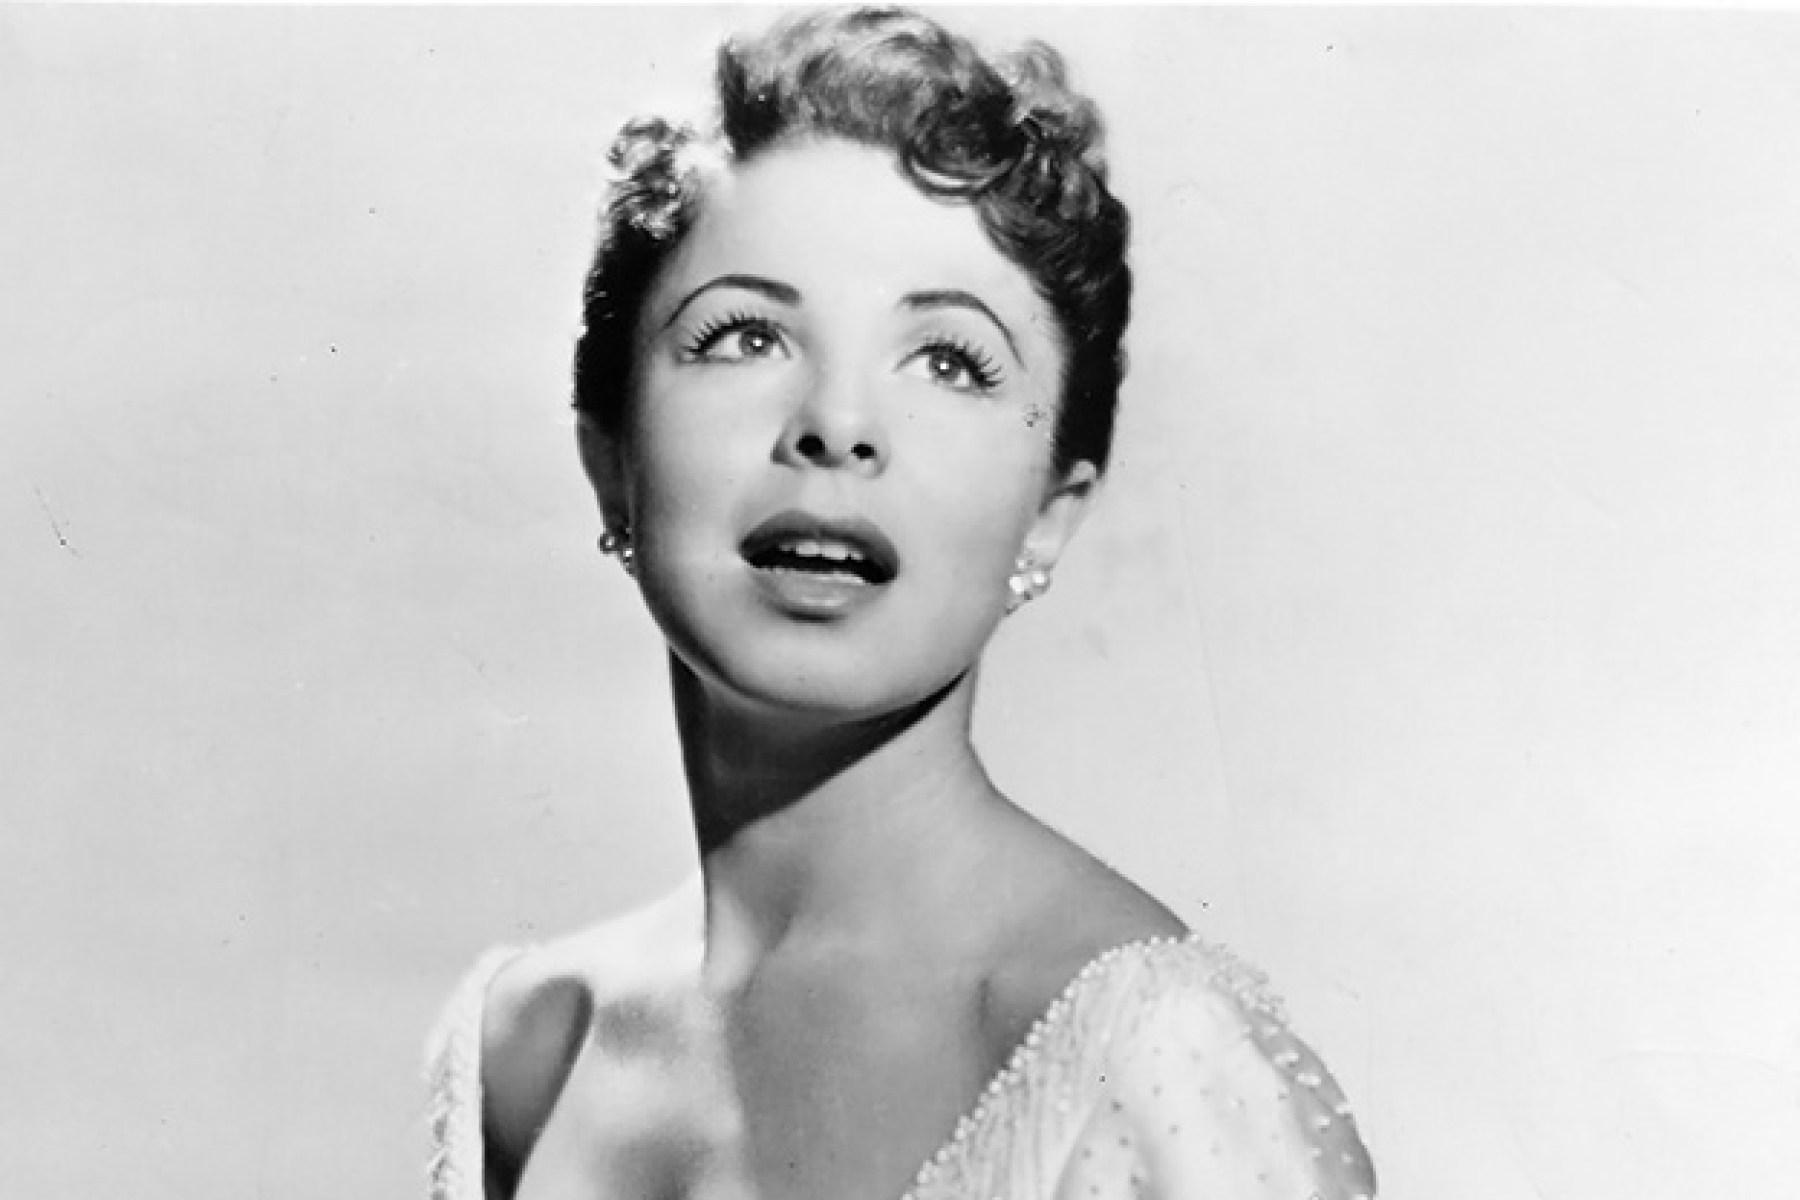 Eydie Gorme, 'Blame it on the Bossa Nova' Singer, Dead at 84 - Rolling Stone